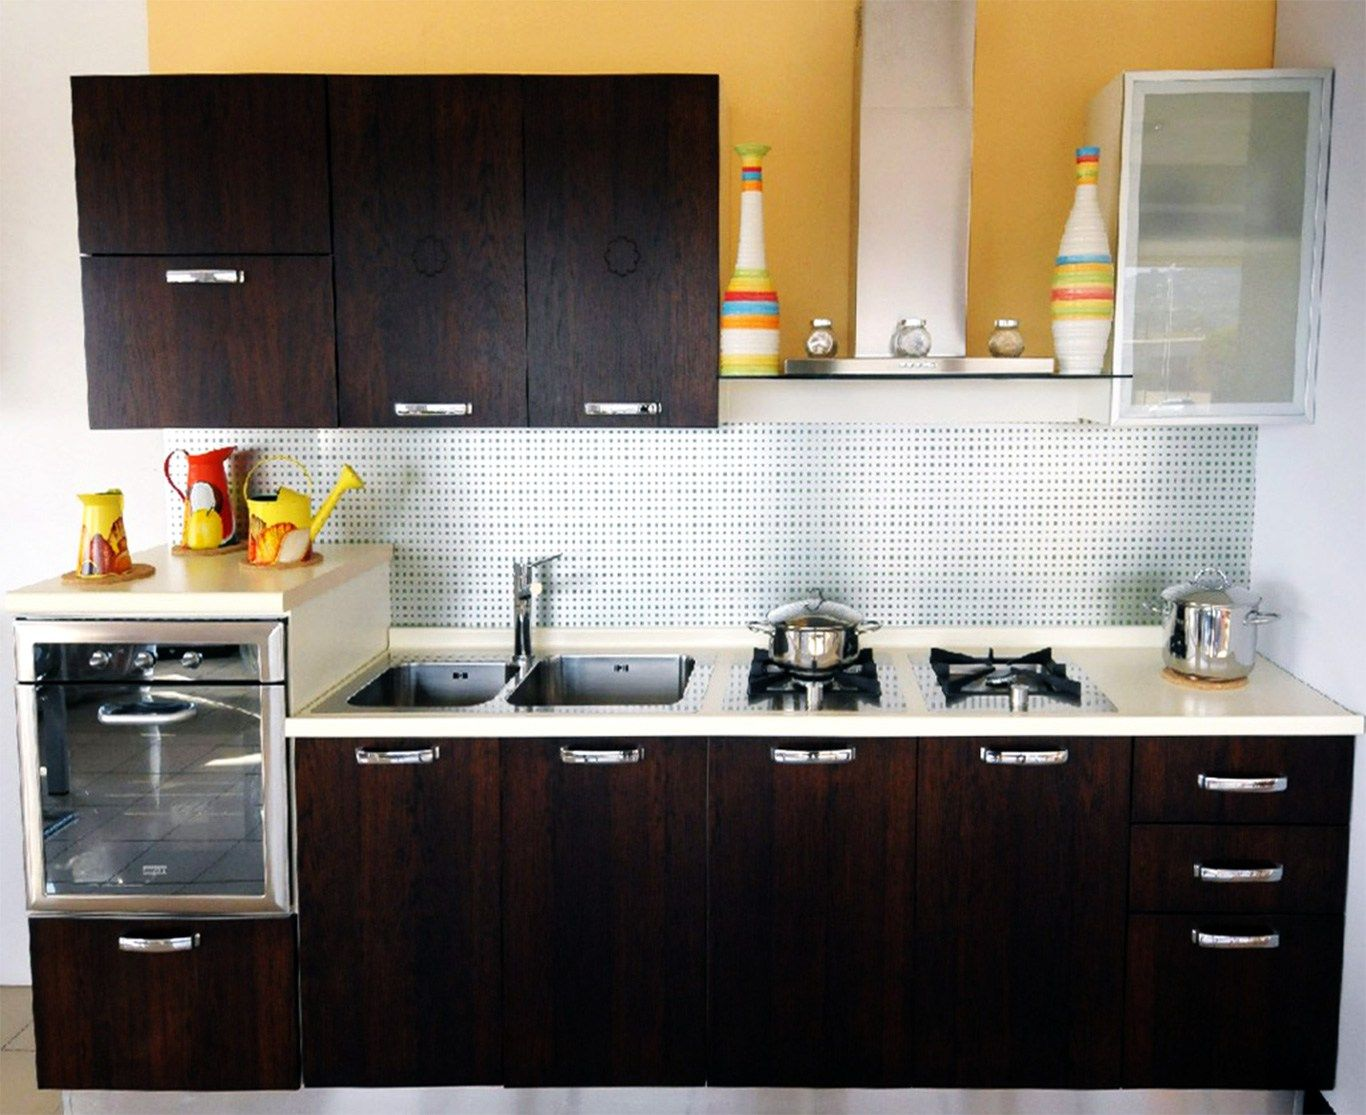 kitchen remarkable simple kitchen cabinet designs simple build wooden basic kitchen cabinet on kitchen ideas simple id=88711